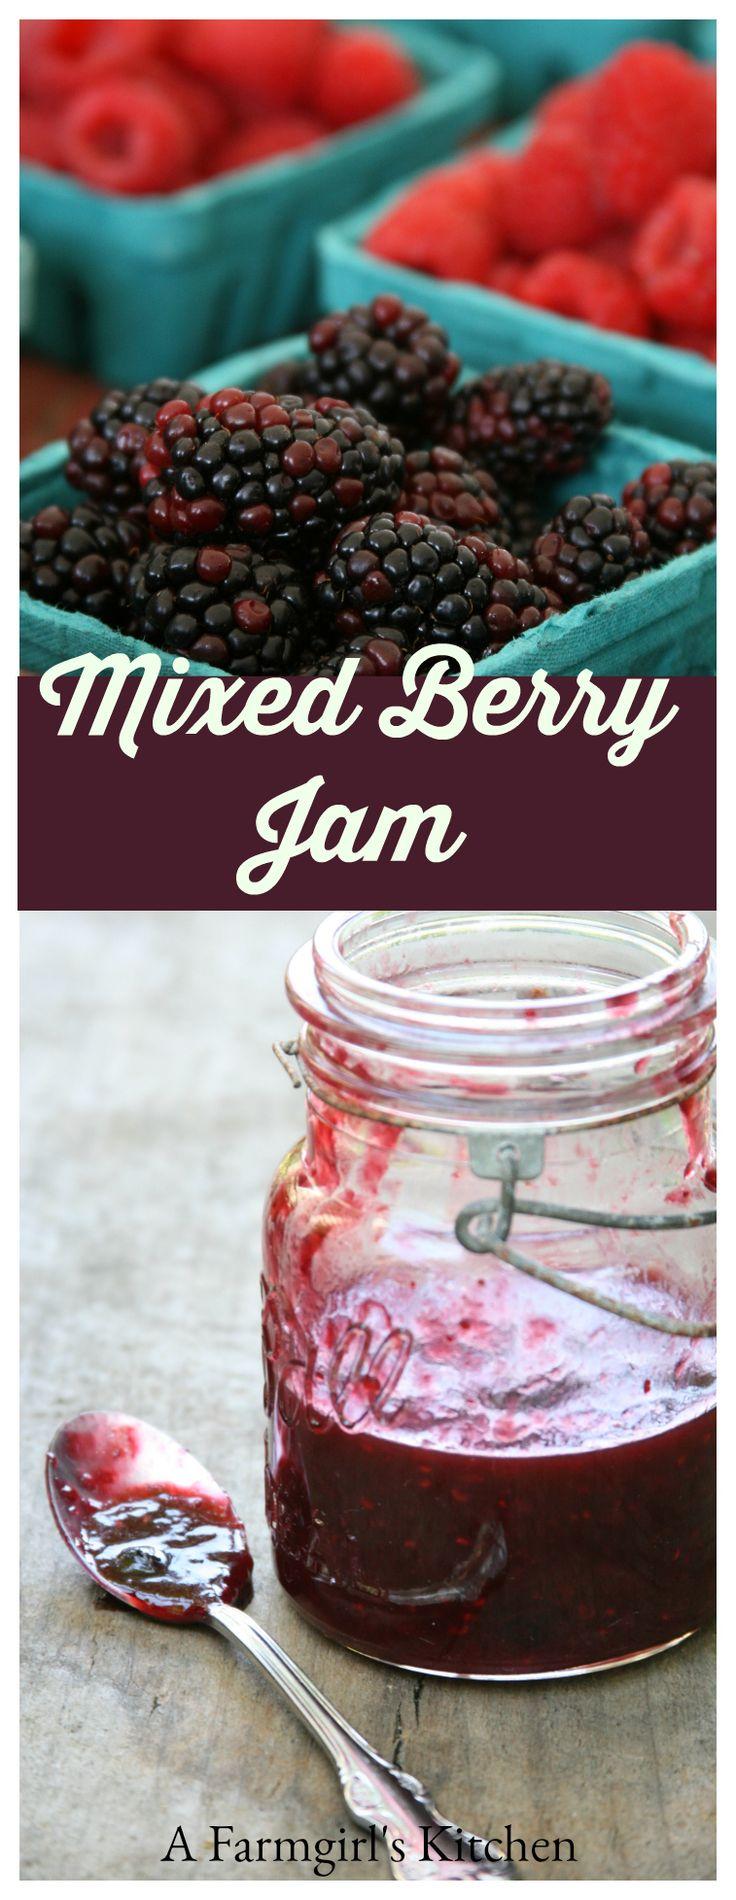 Homemade Mixed Berry Jam #recipe #recipes #foodblogger http://afarmgirlskitchen.com/mixed-berry-jam/